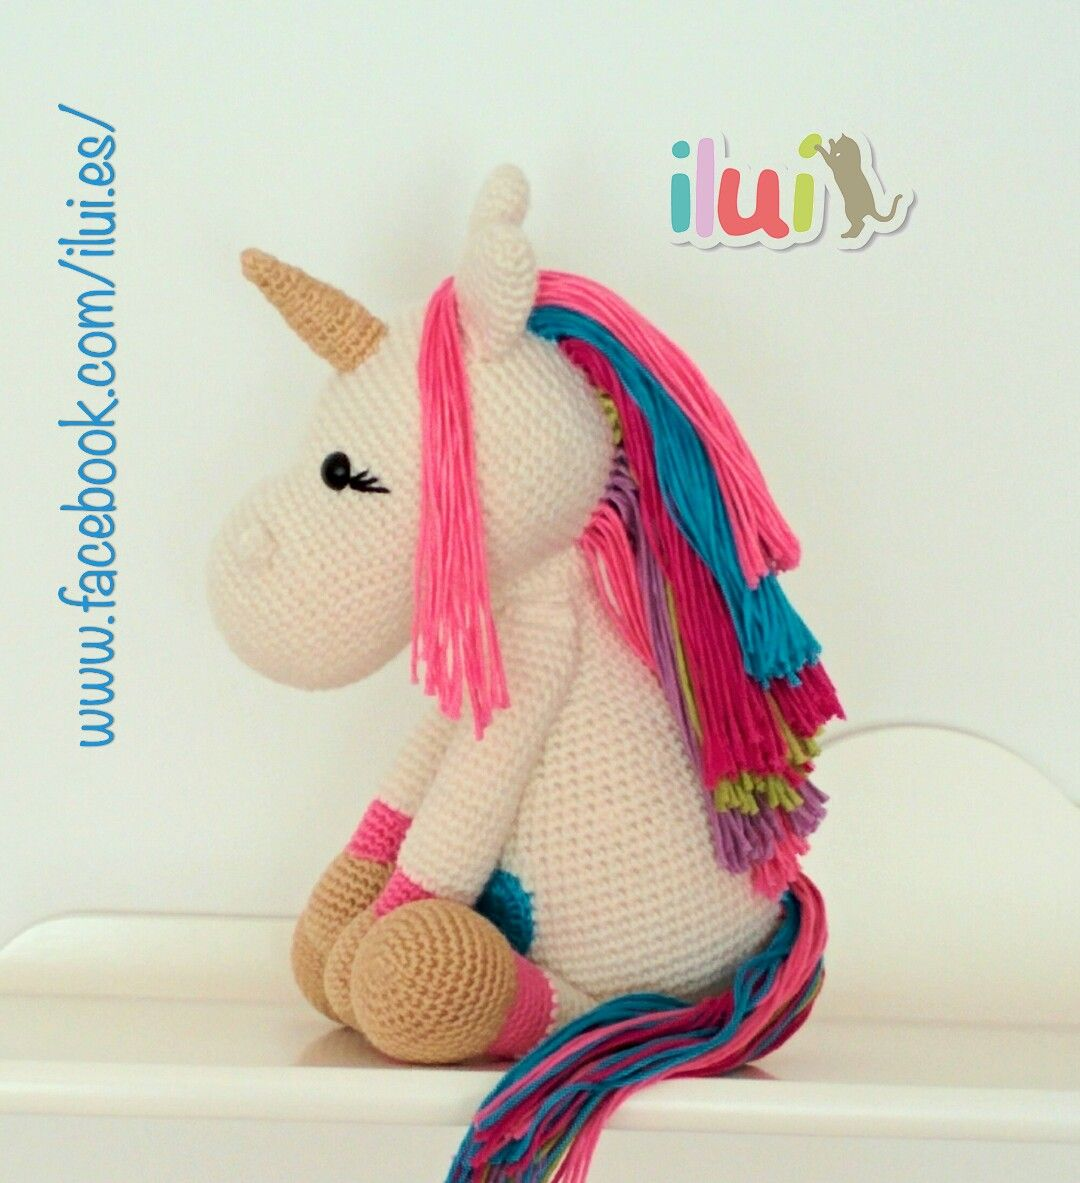 Peluche unicornio tejido con la técnica amigurumi. Realizado con ...